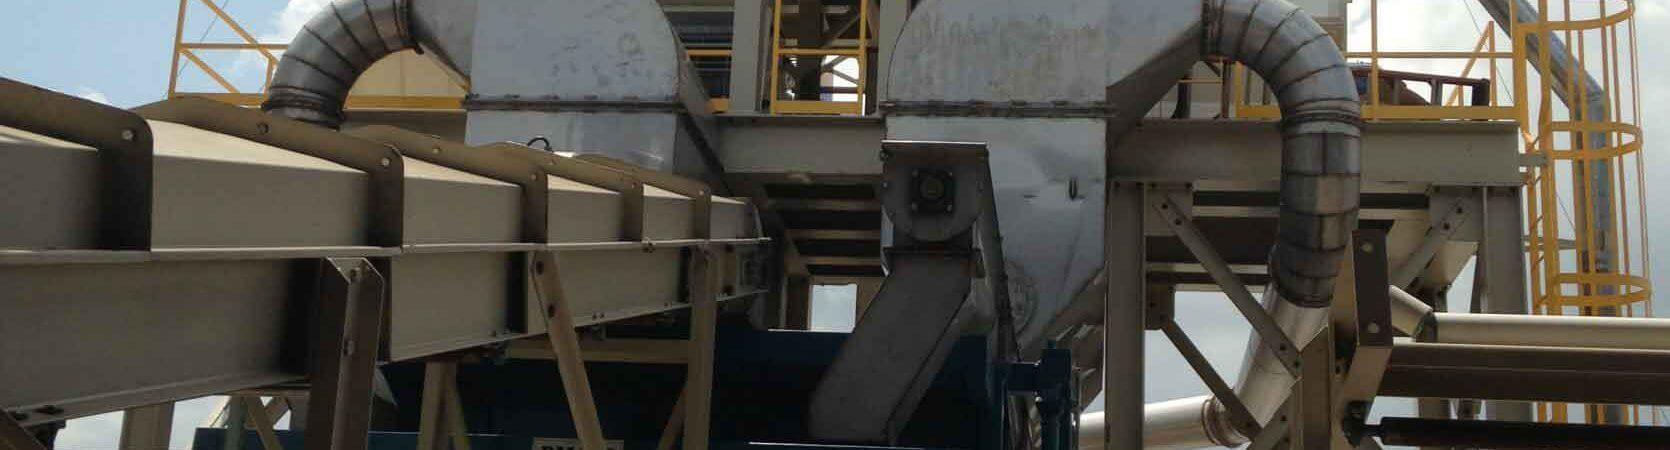 covert fiber mill wood pellet plant